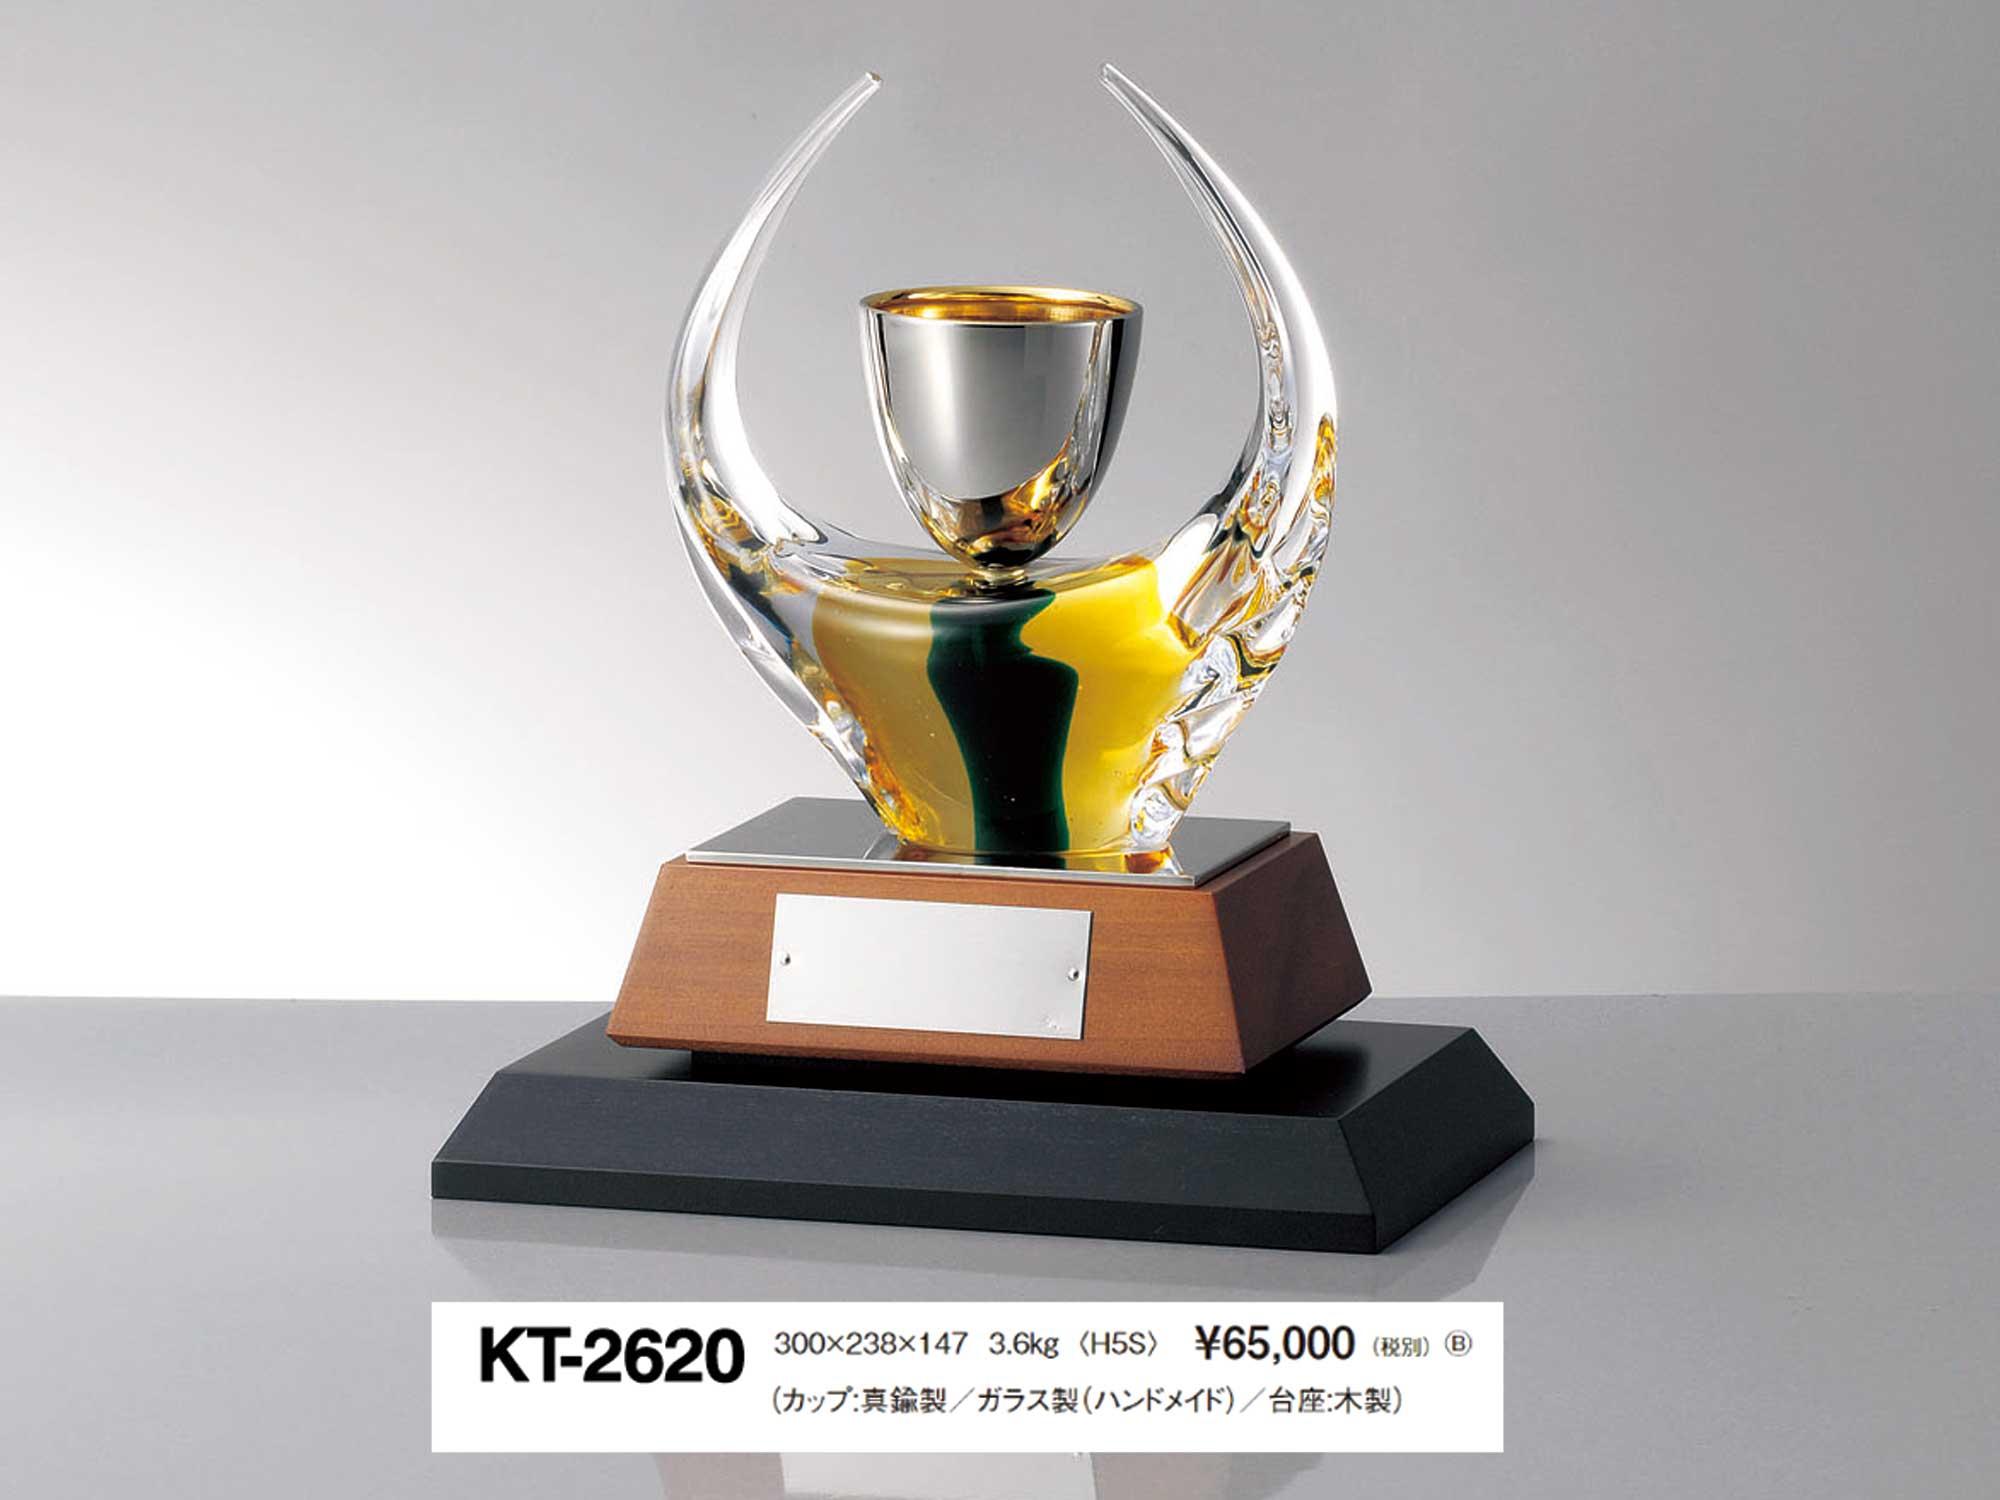 KT2620